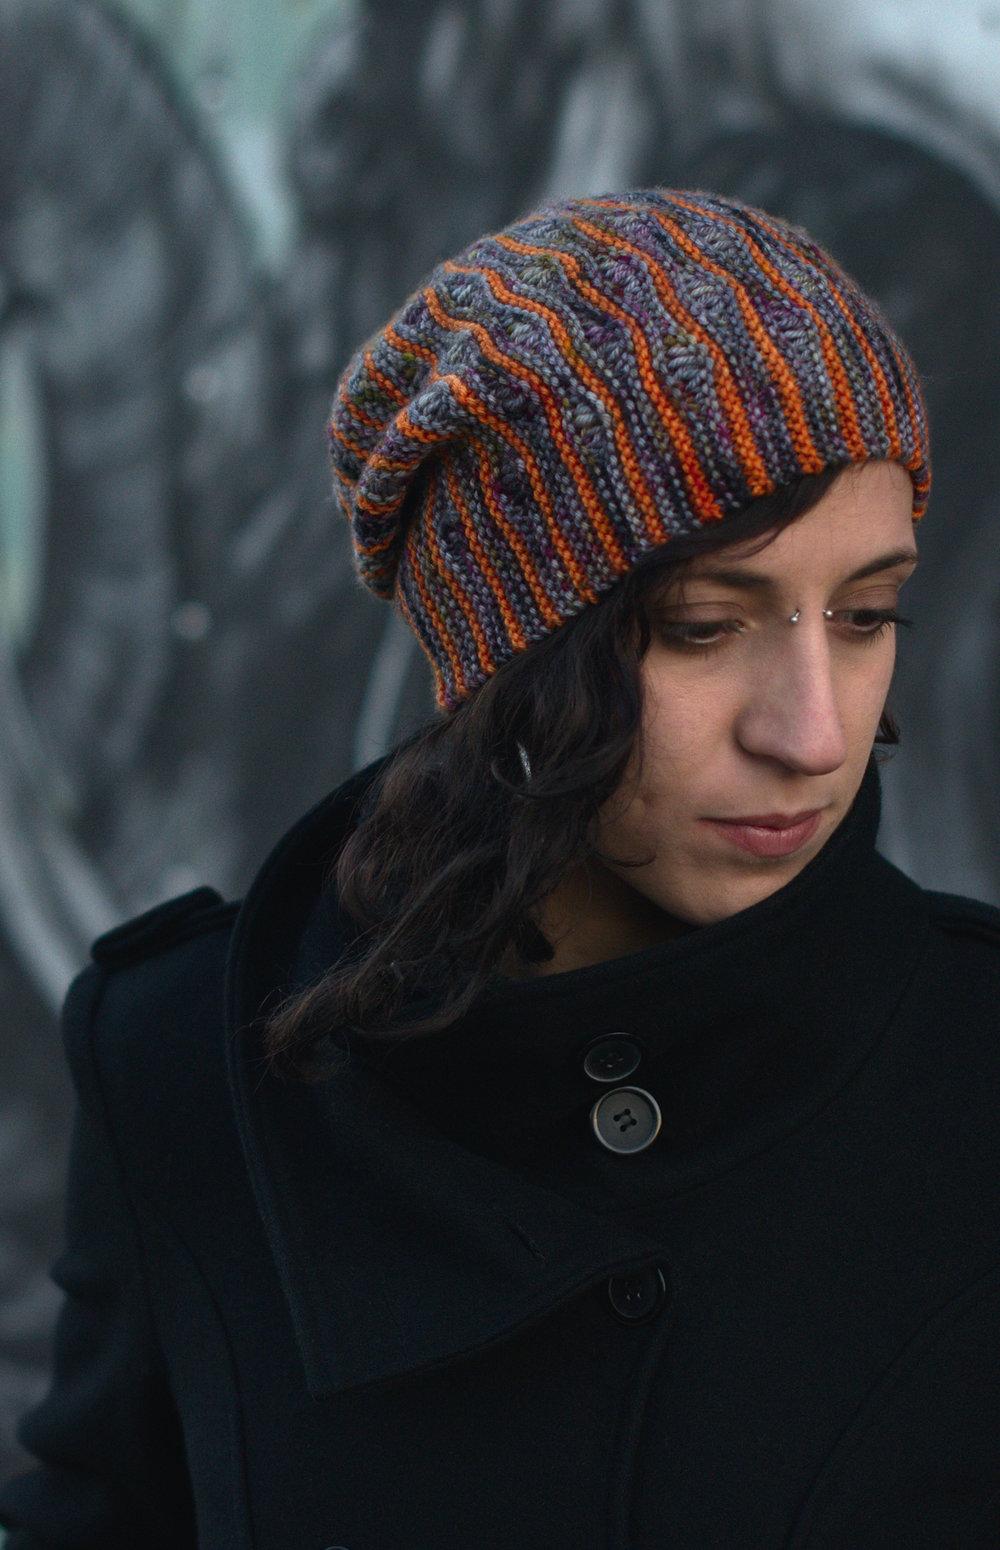 Laminard sideways knit slouchy Hat hand knitting pattern for hand-dyed DK yarns